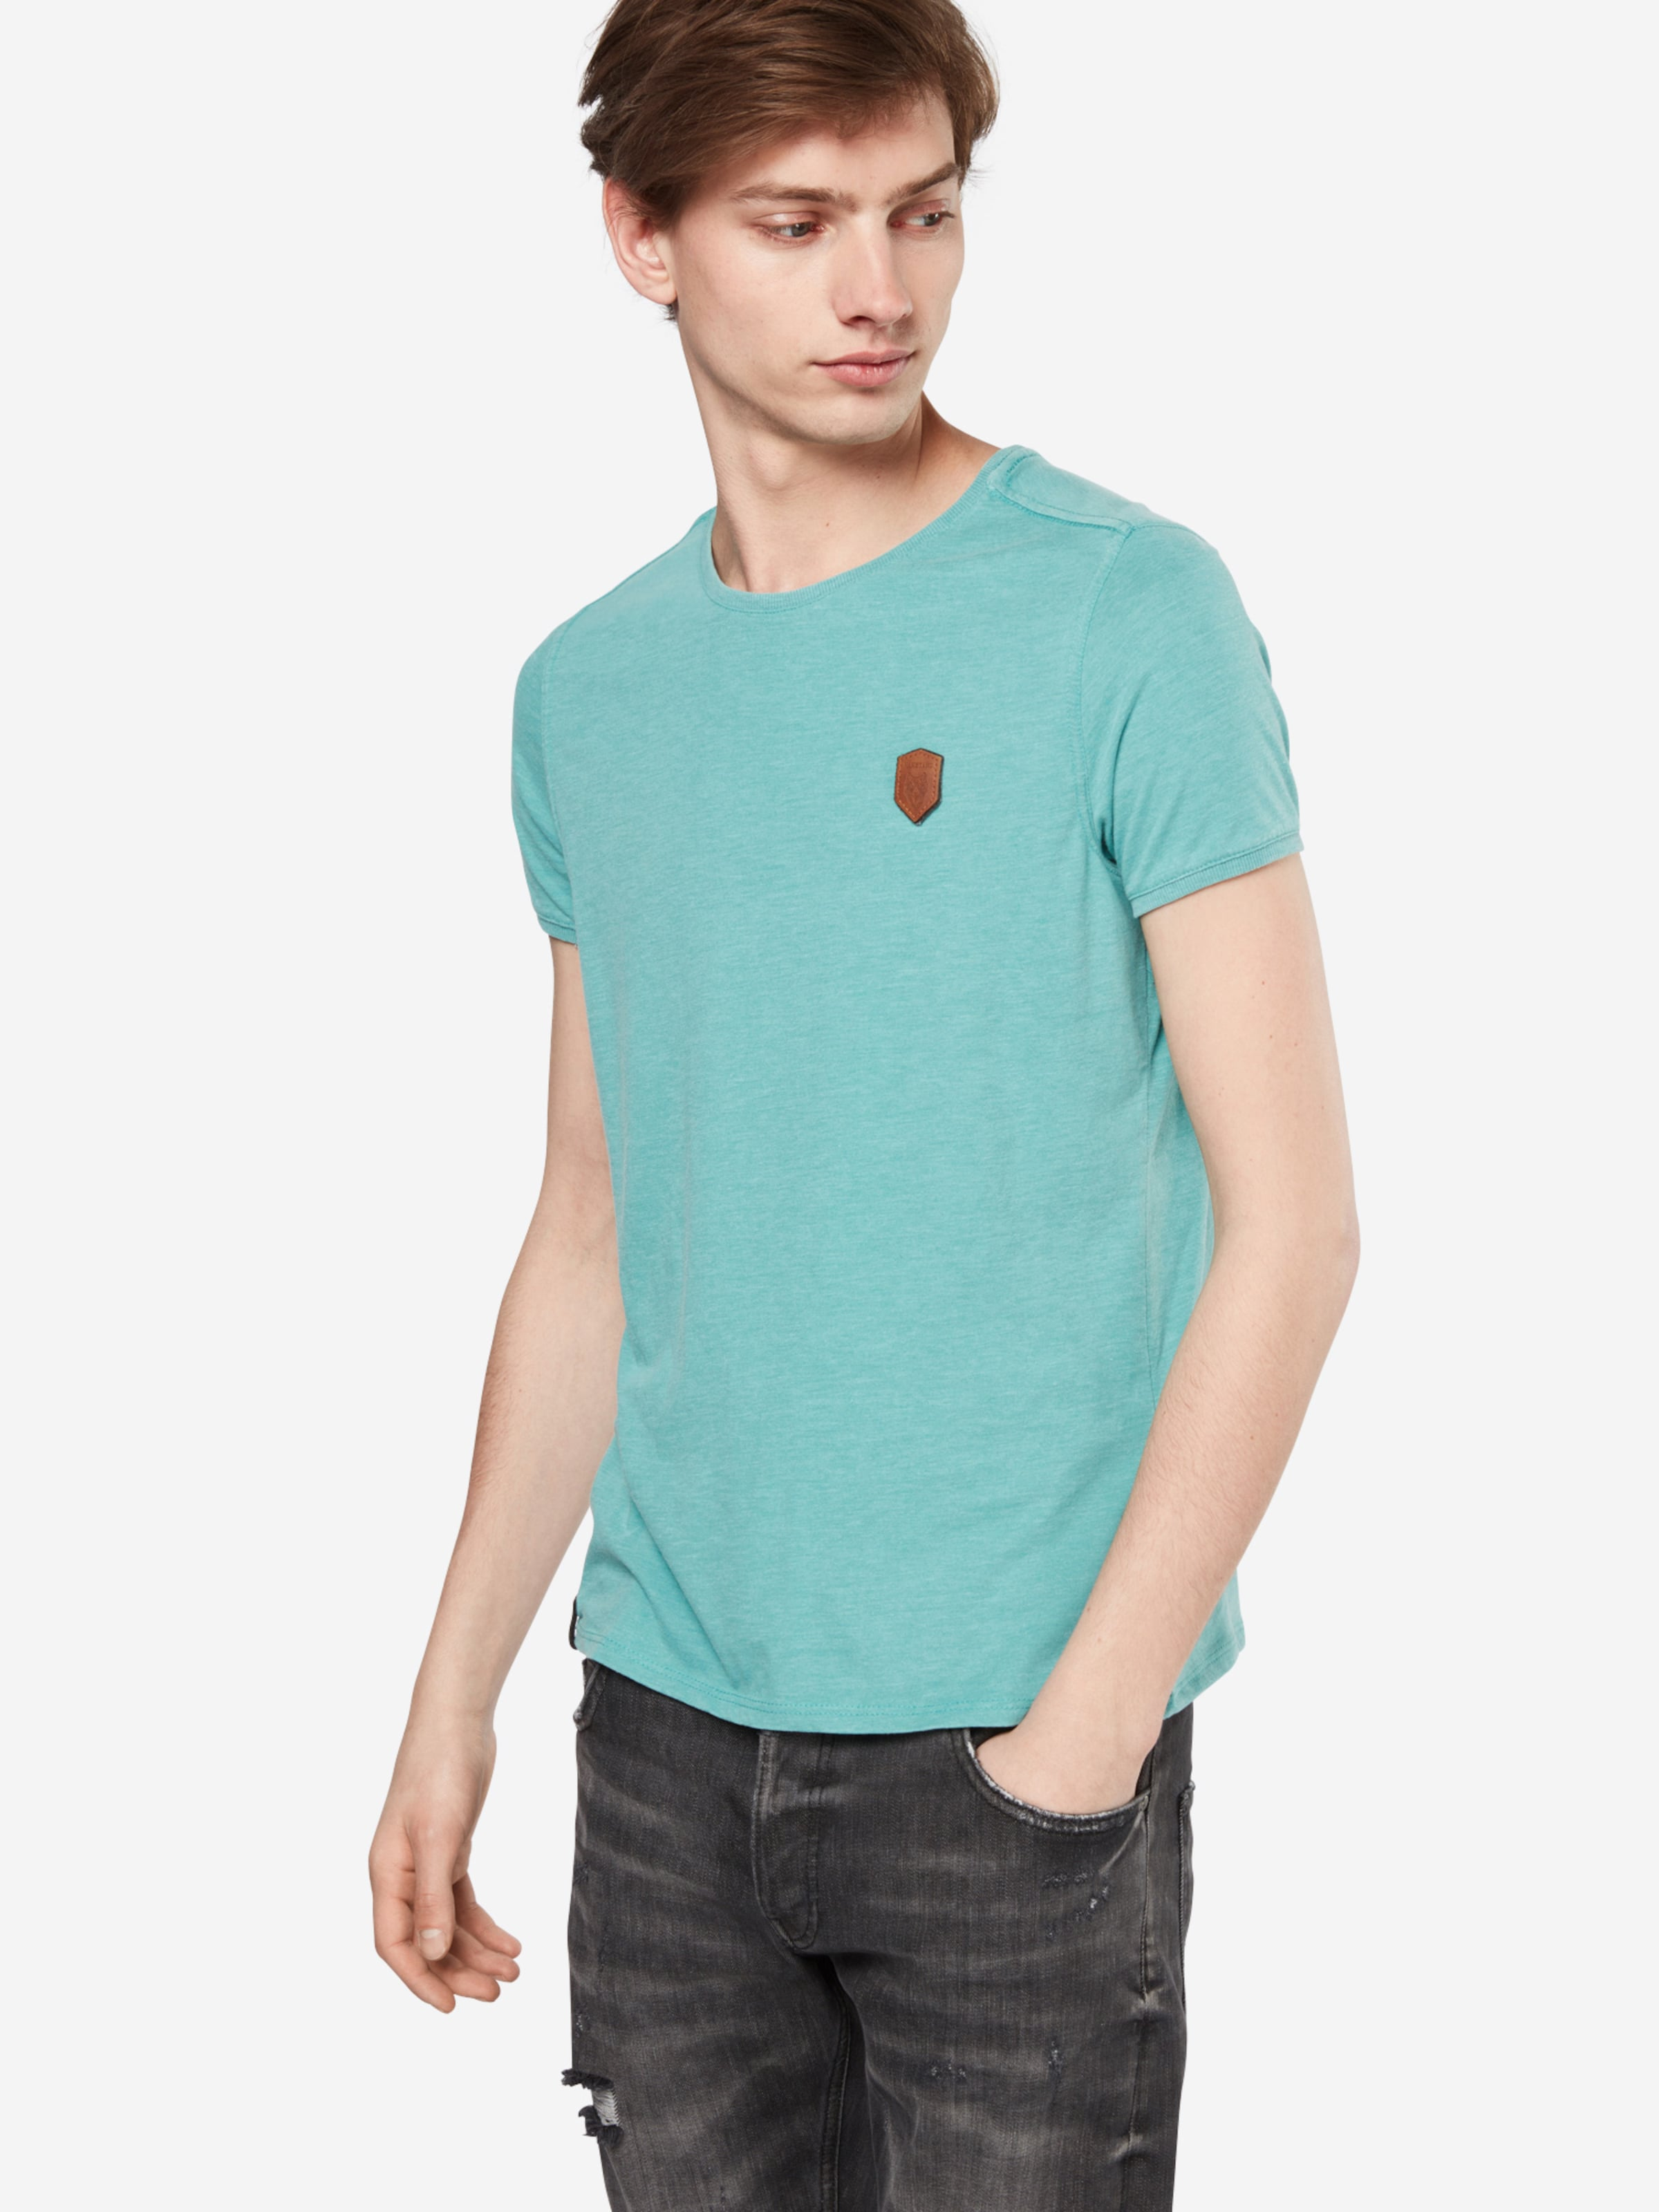 Niedrige Versand Online Billig Verkauf 2018 Neue naketano T-Shirt 'Halim Trabando' Footlocker Abbildungen Günstig Online Billig Verkauf 2018 pfzDTb